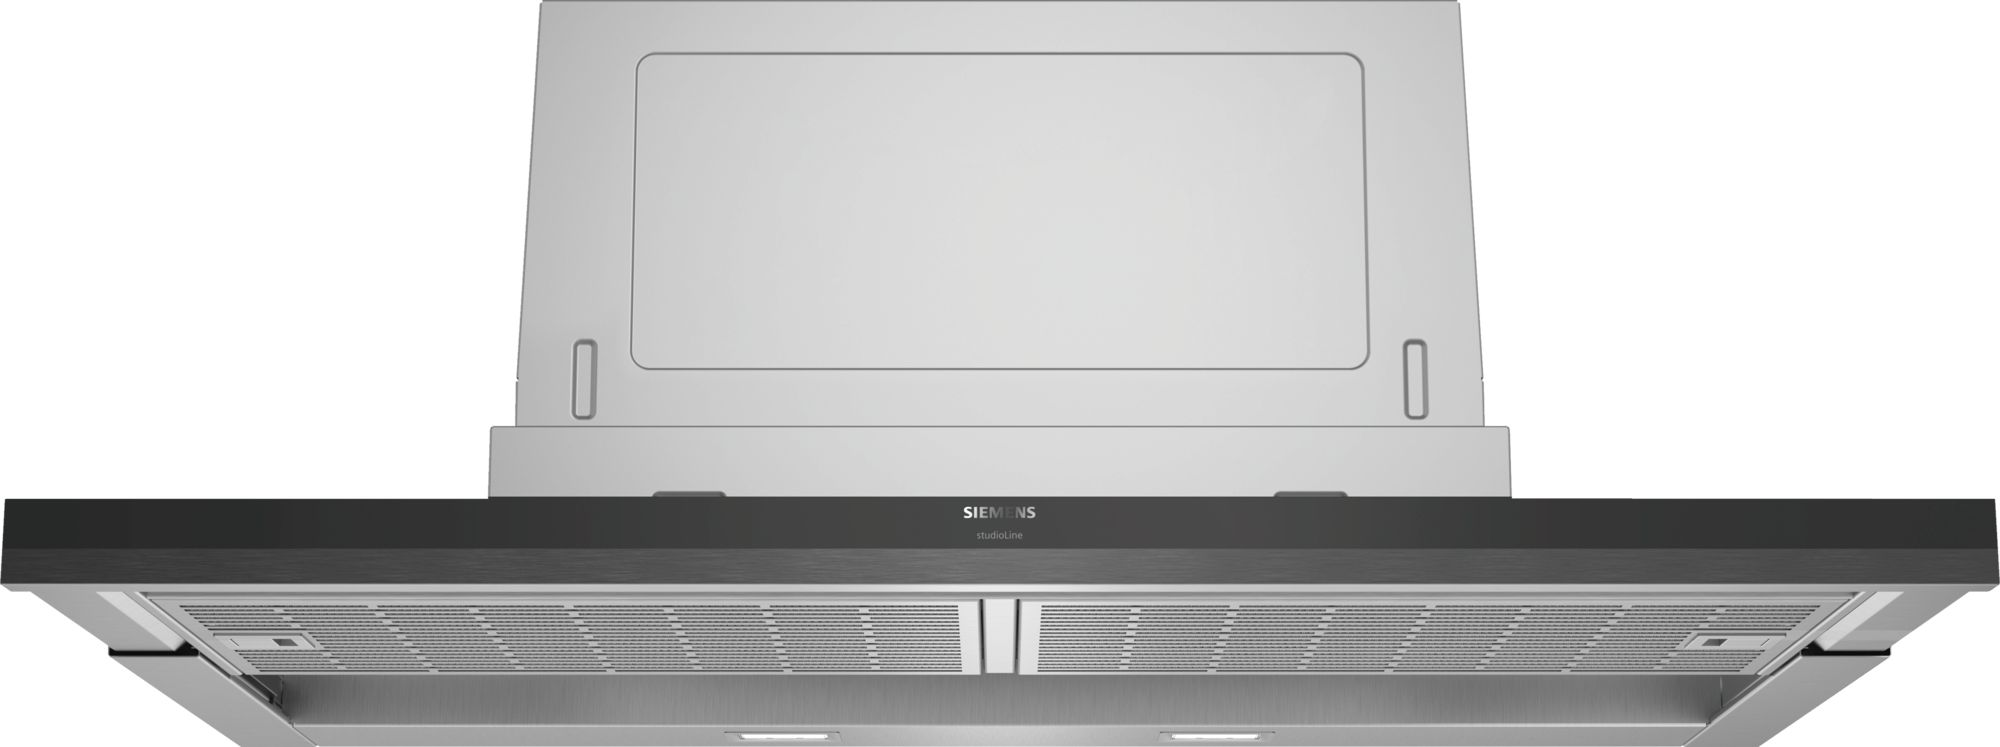 Siemens LI97SA560S Flachschirmhaube Edelstahl